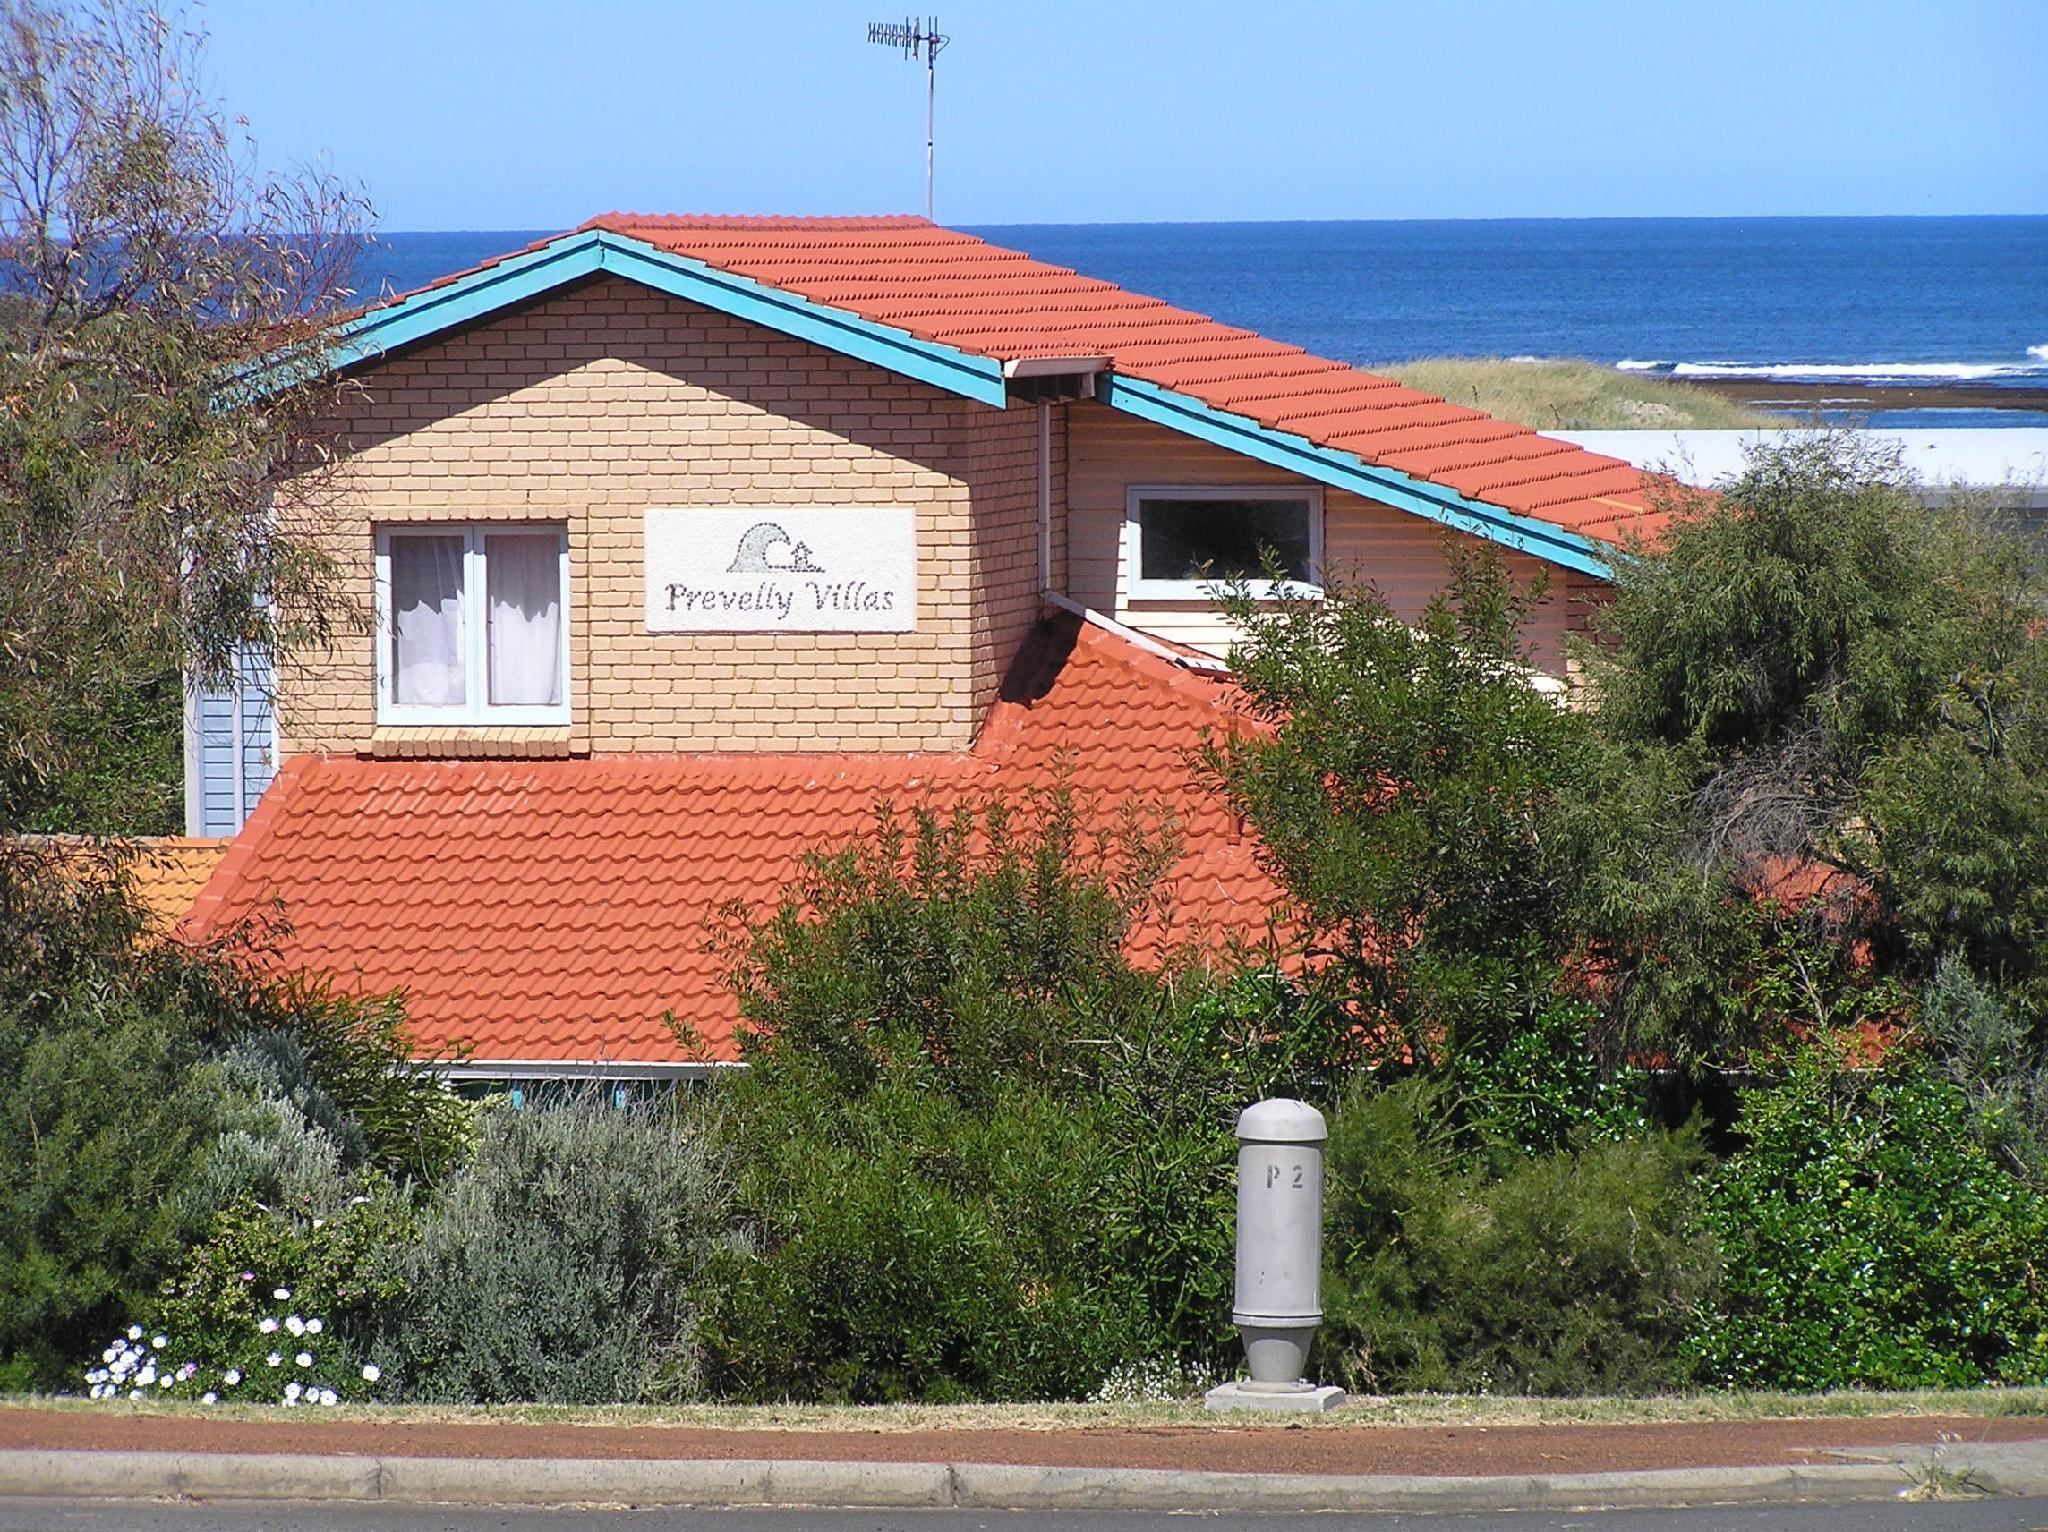 Beachside Prevelly Villas